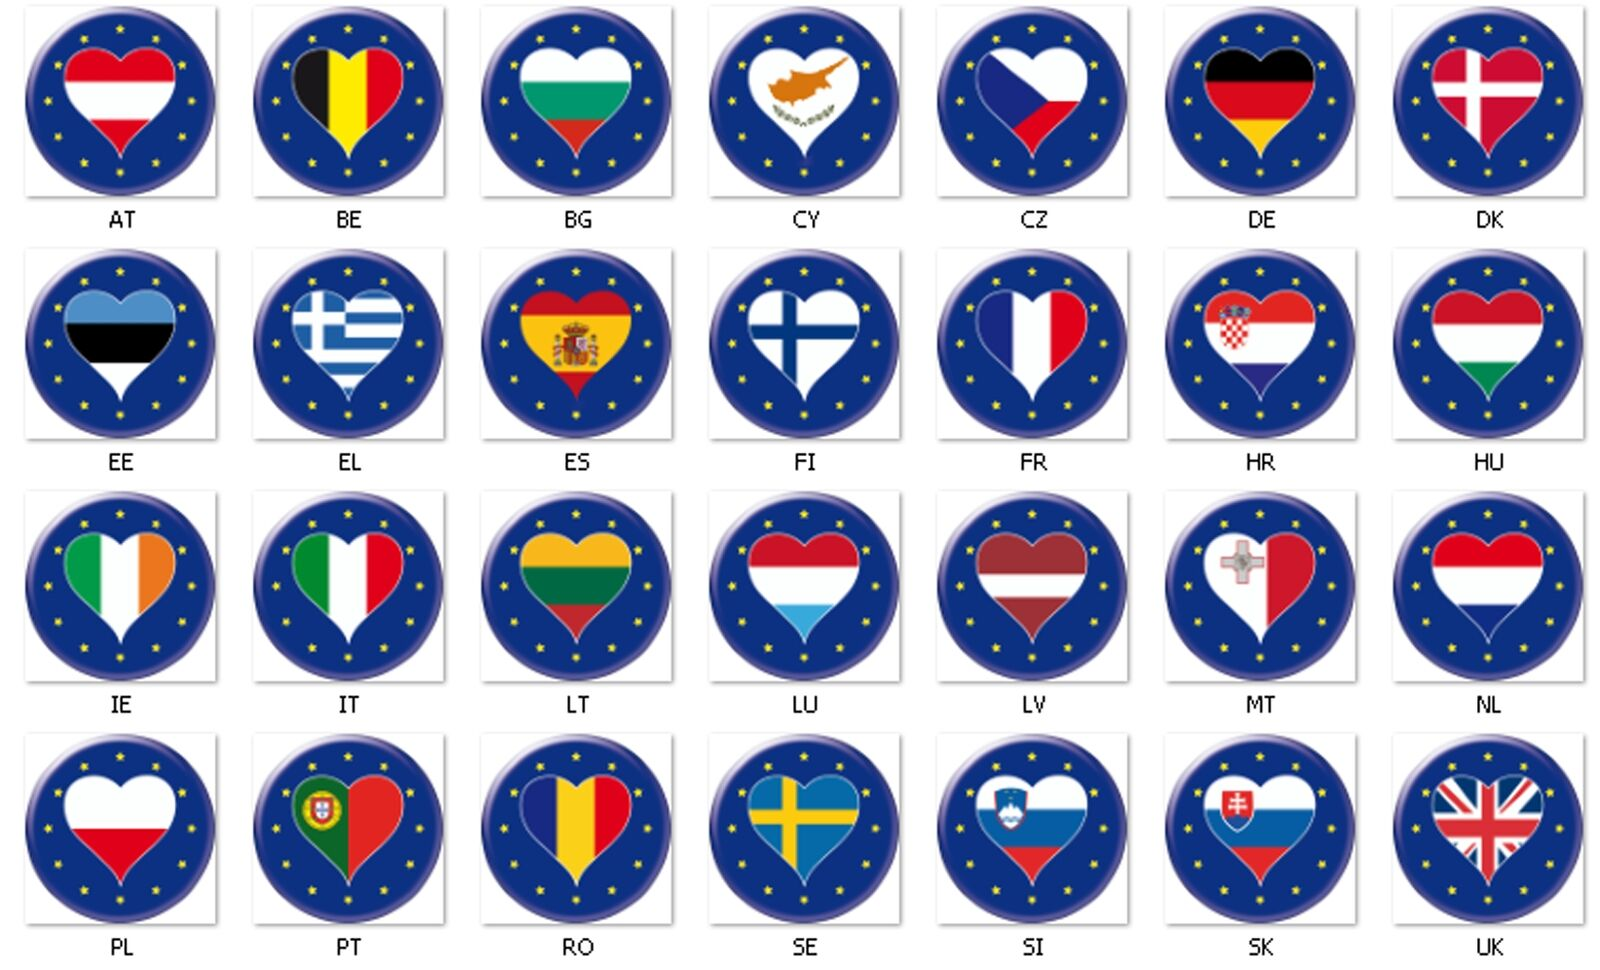 Décapsuleur Décapsuleur Décapsuleur porte clef Drapeau Europa  Flag FI-(FINLAND) b8d990